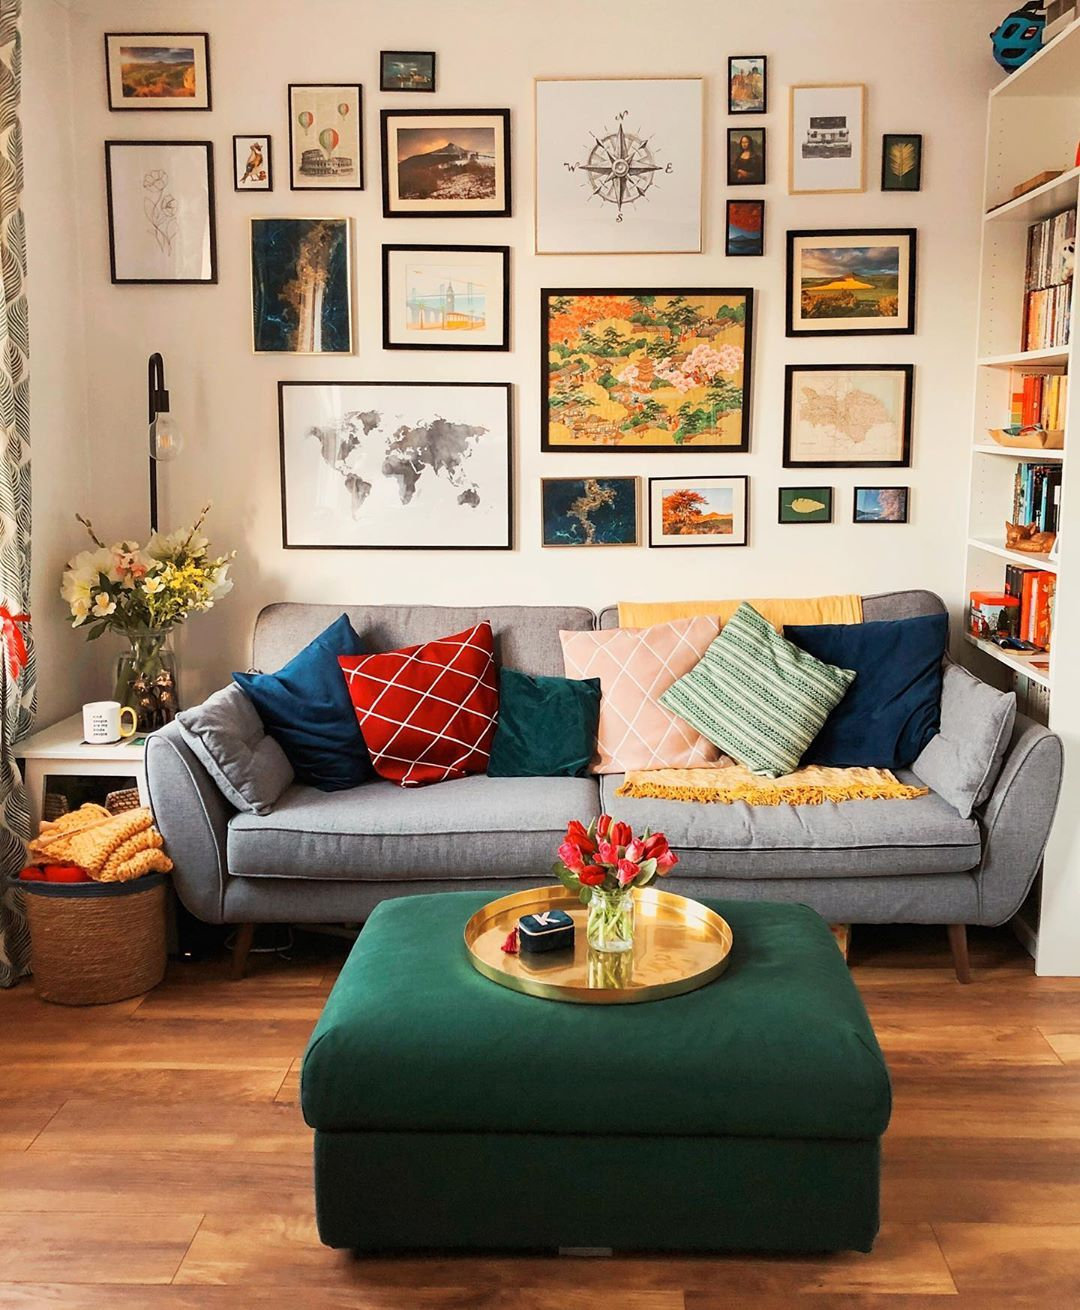 Pin On Living Room Travel living room decor